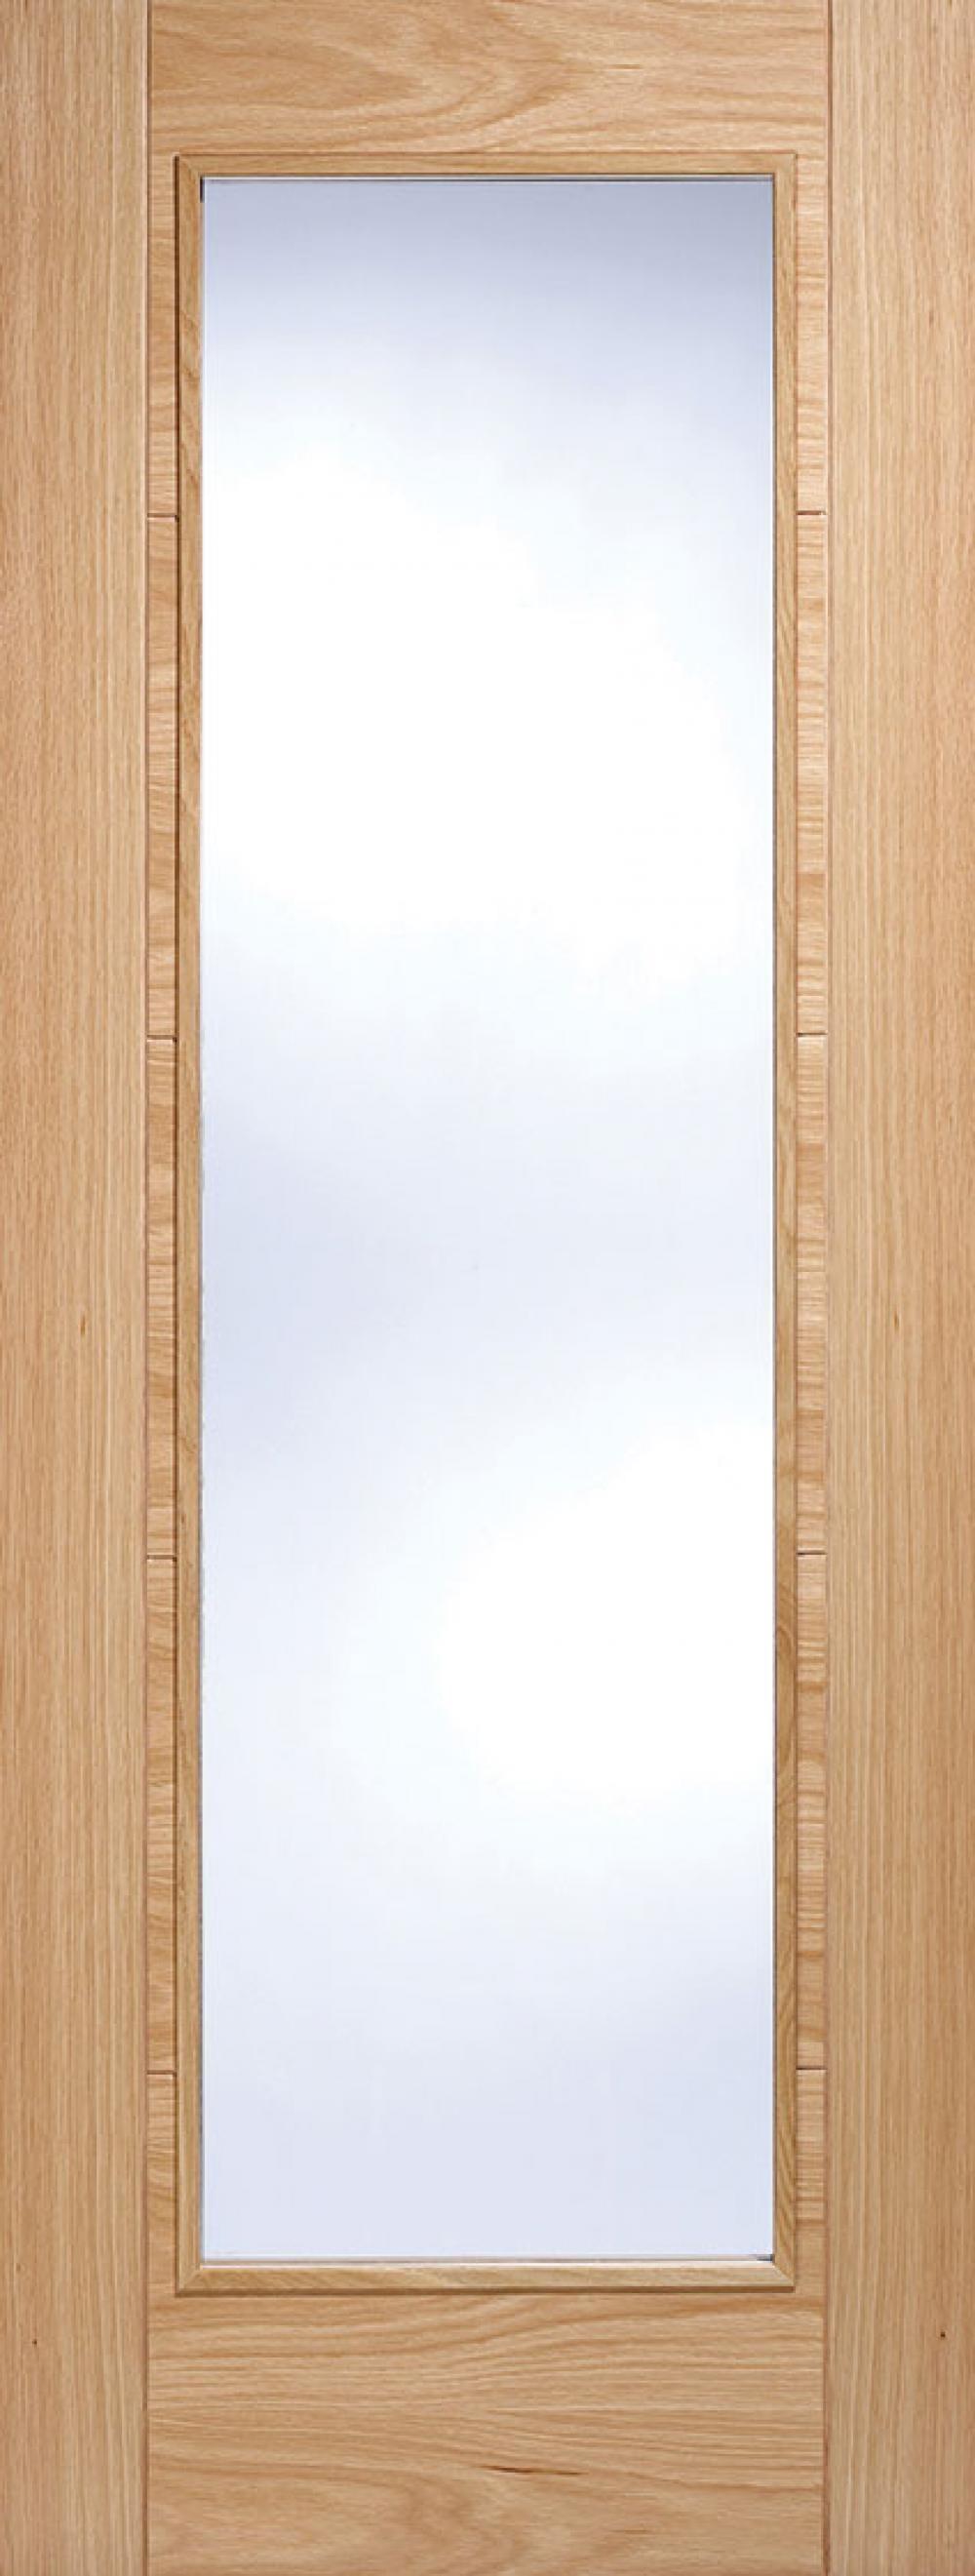 Iseo Oak Pattern 10 Frosted Glazed - Prefinished Image